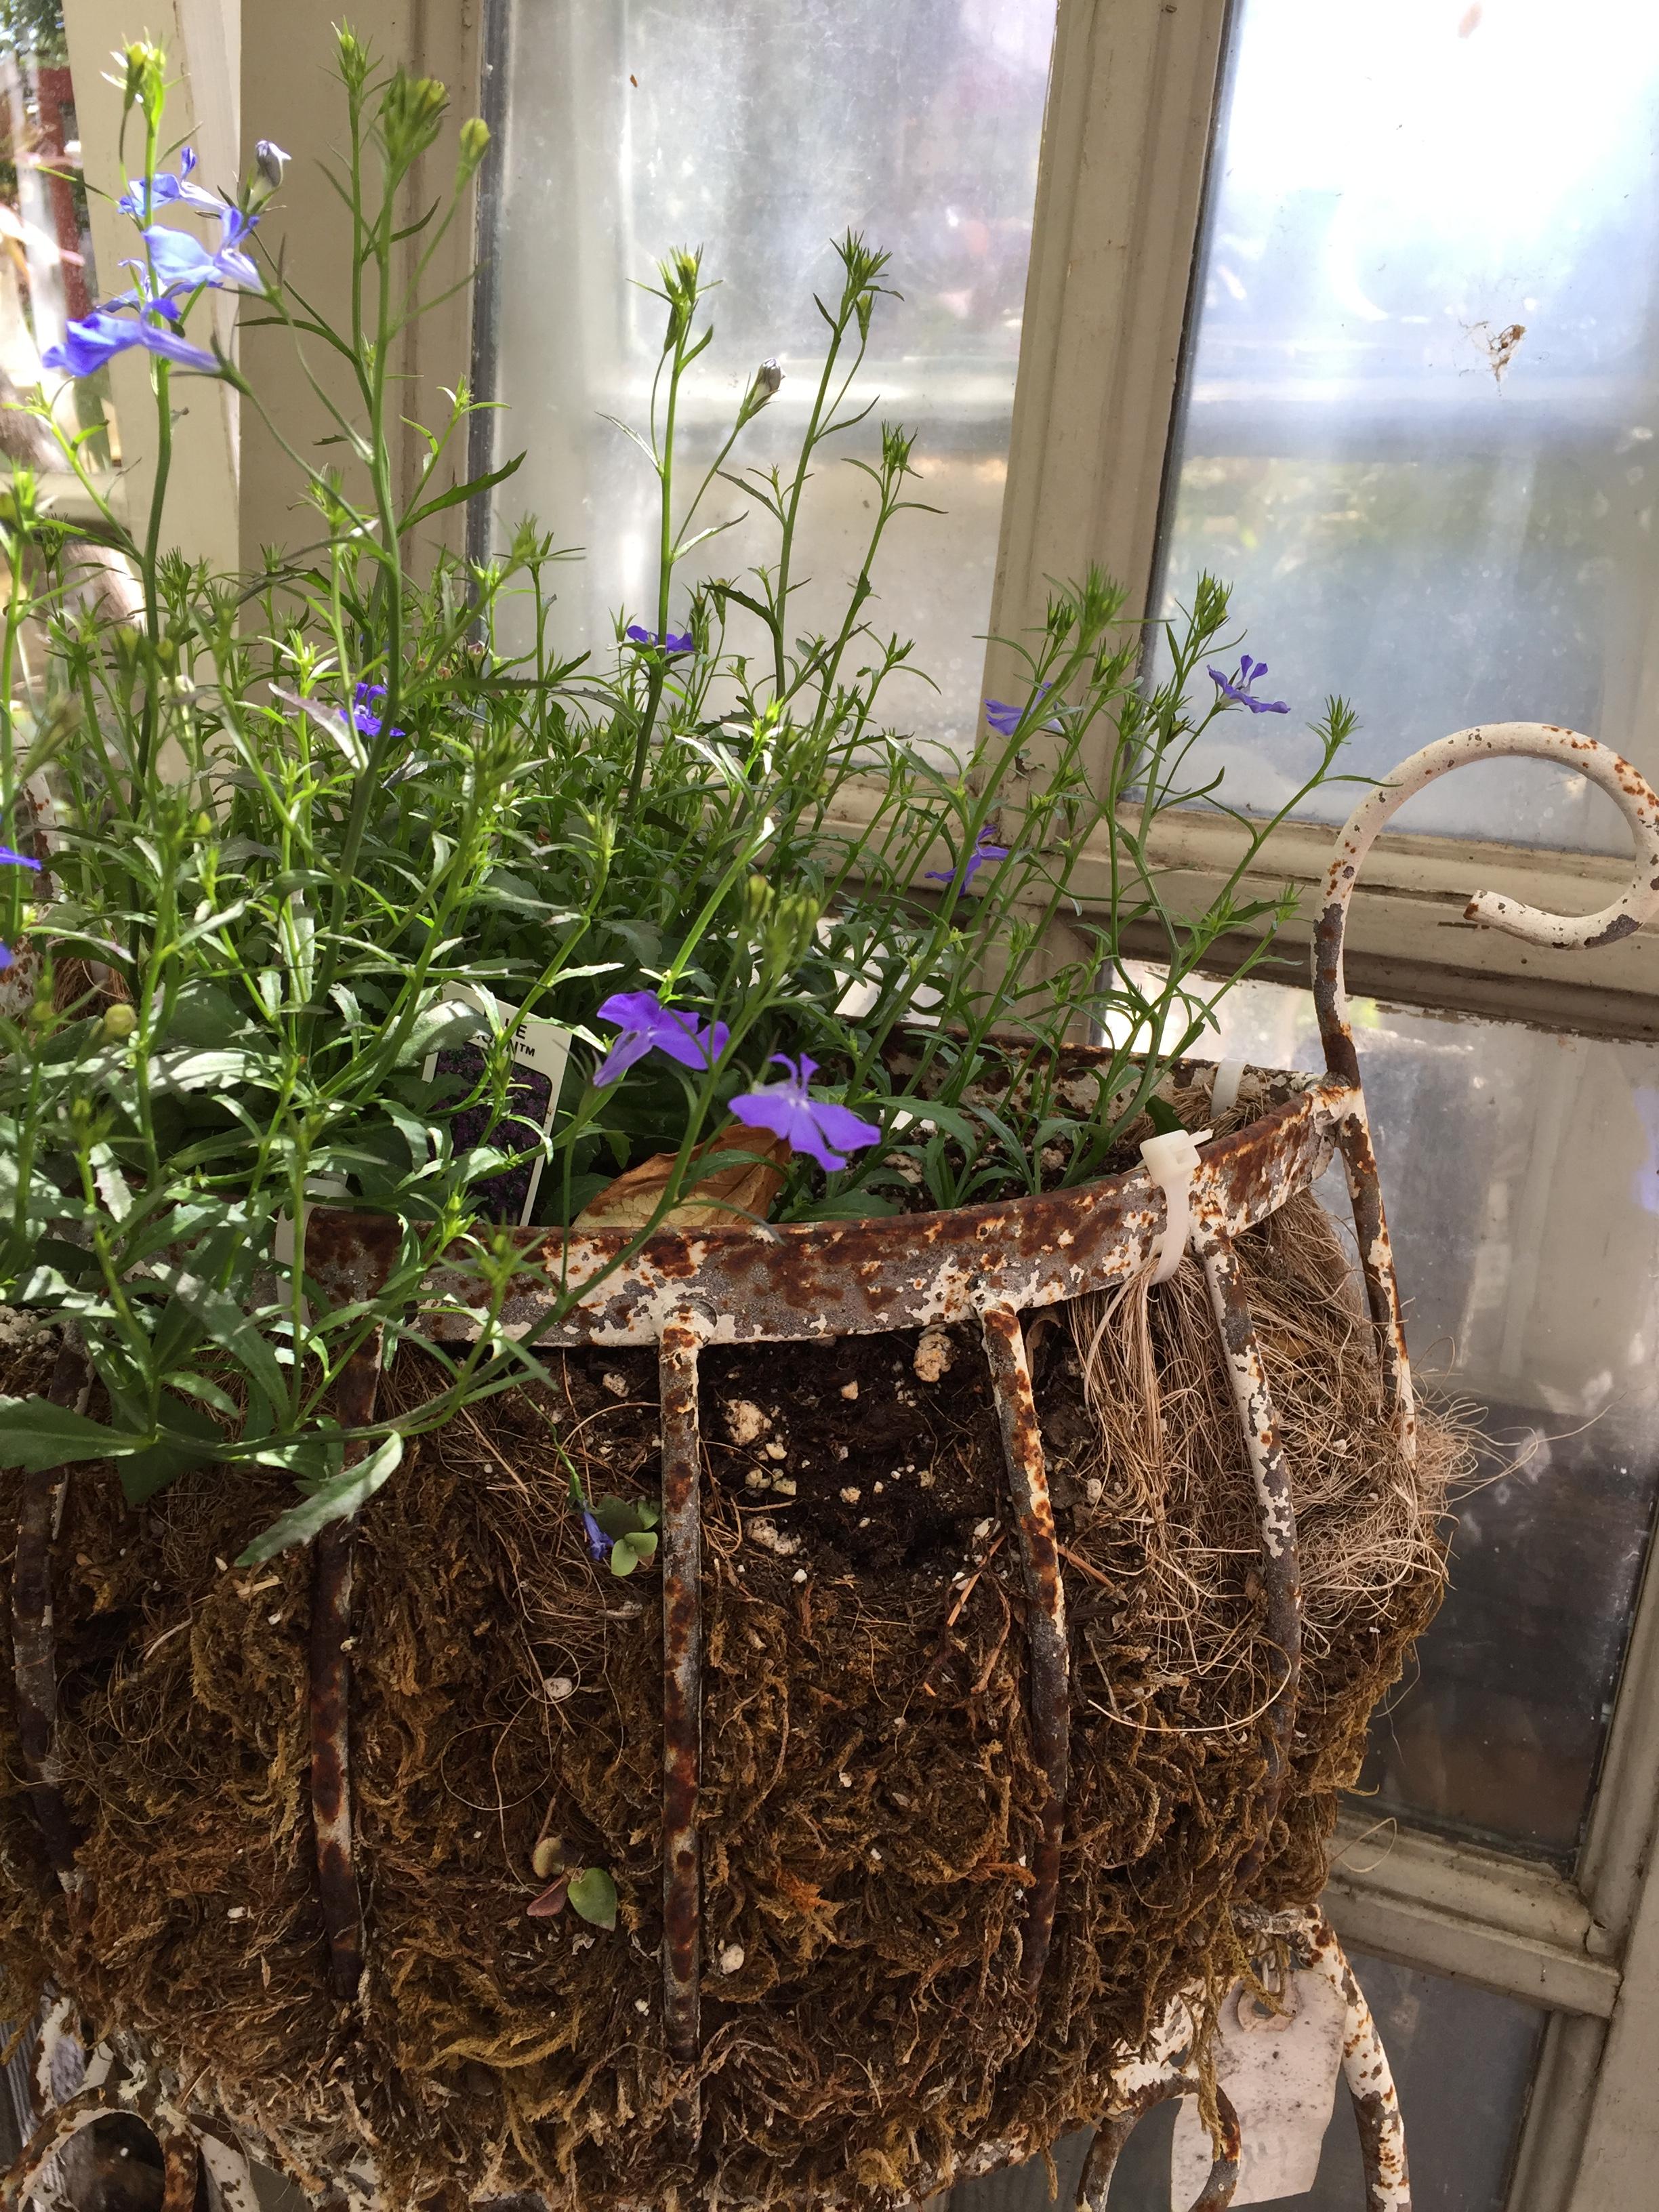 Purple Flower Basket & Hazy Window - Orange 2018-3-9